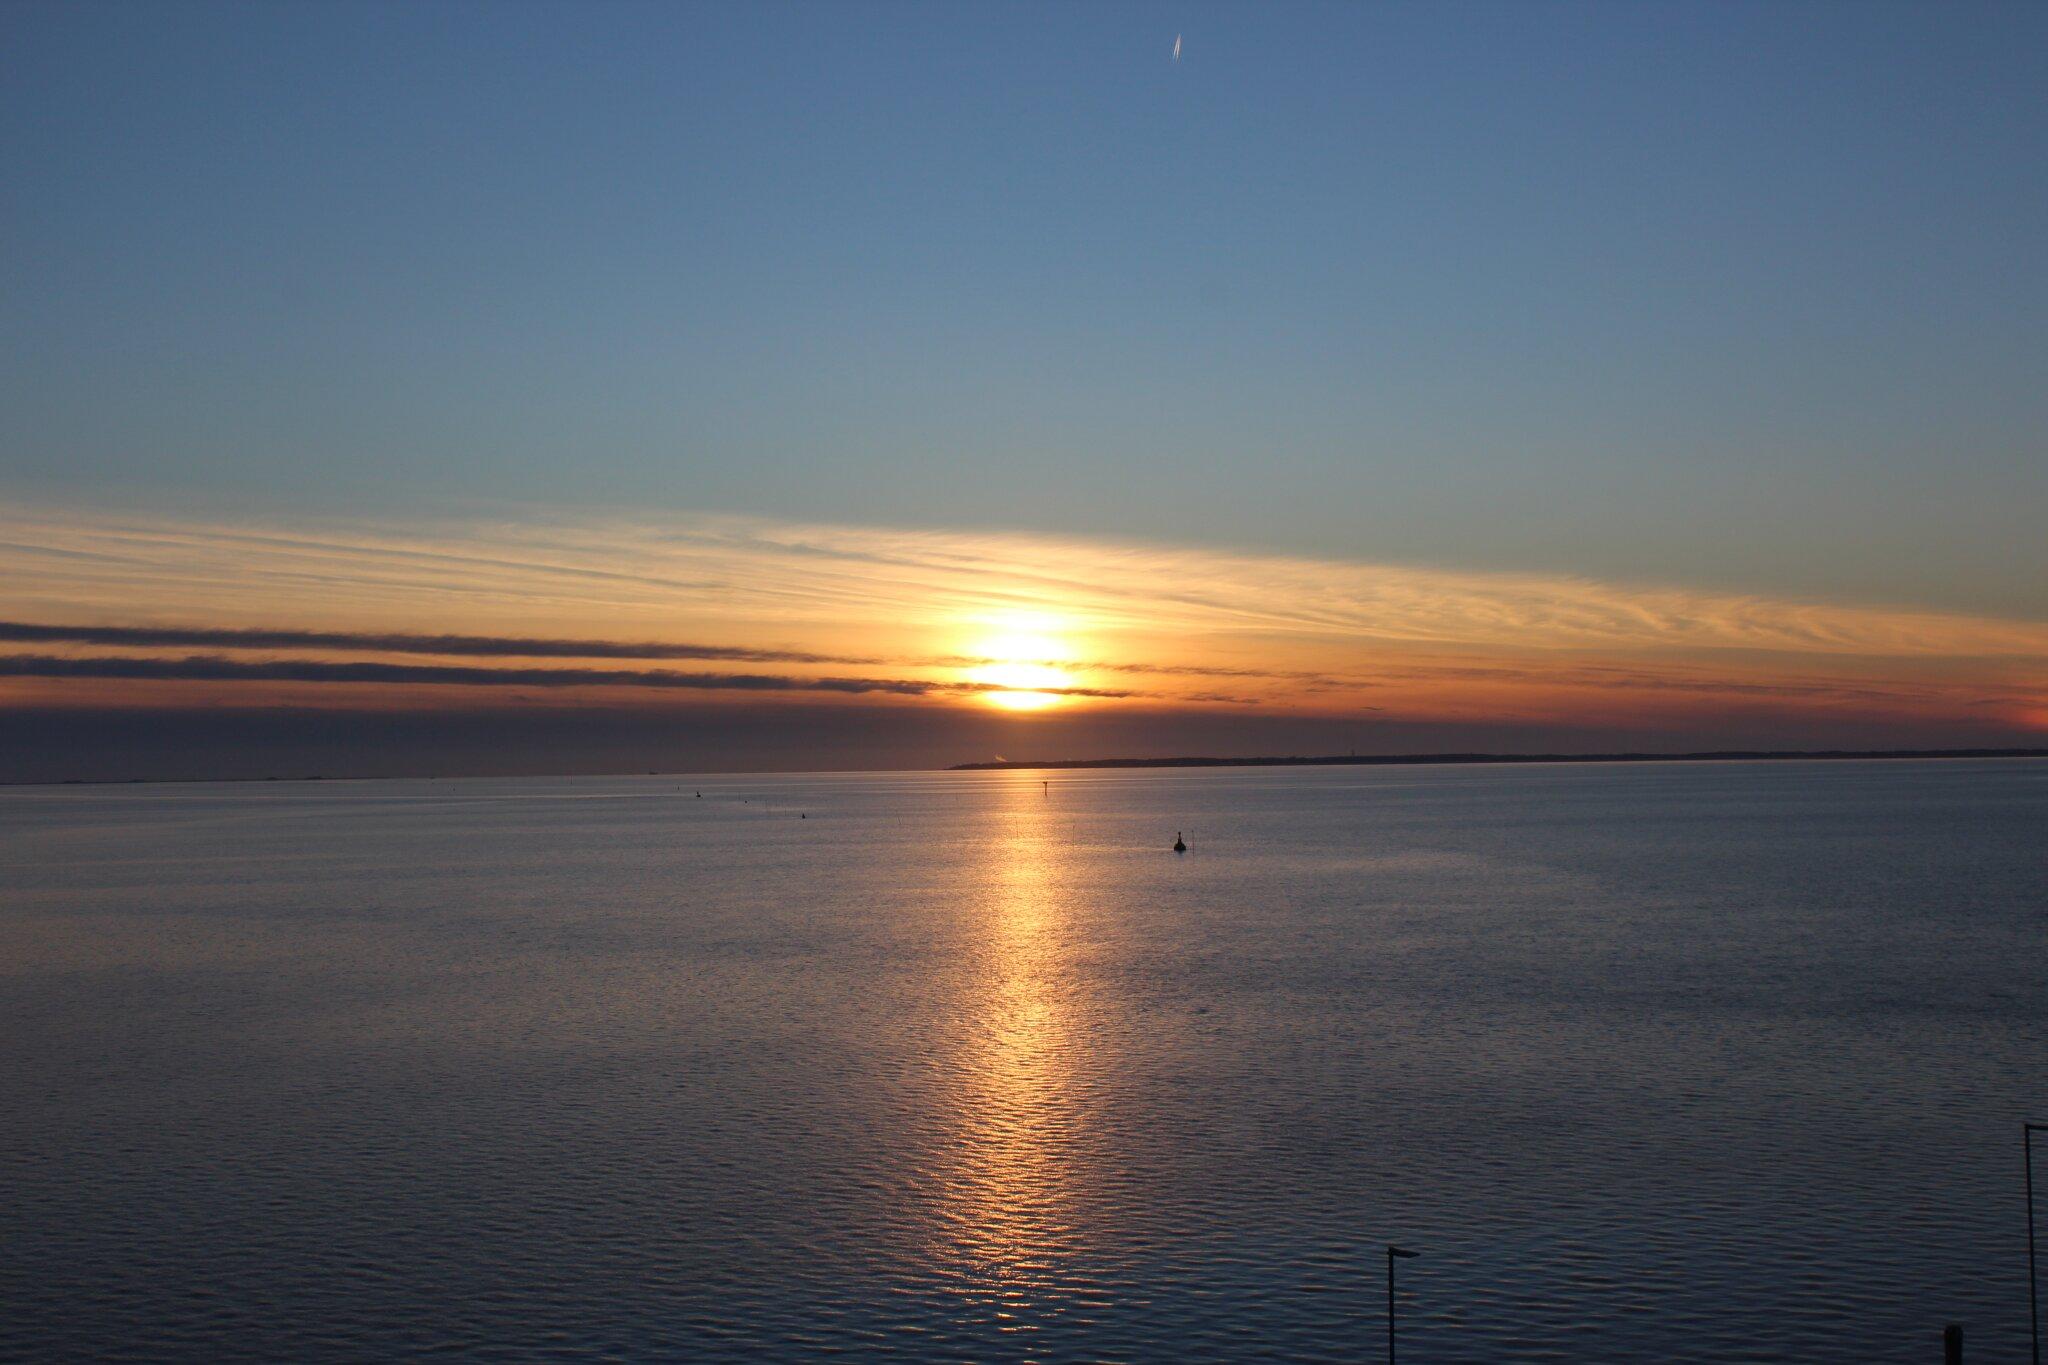 Seetierfangfahrt mit dem Schiff Seeadler